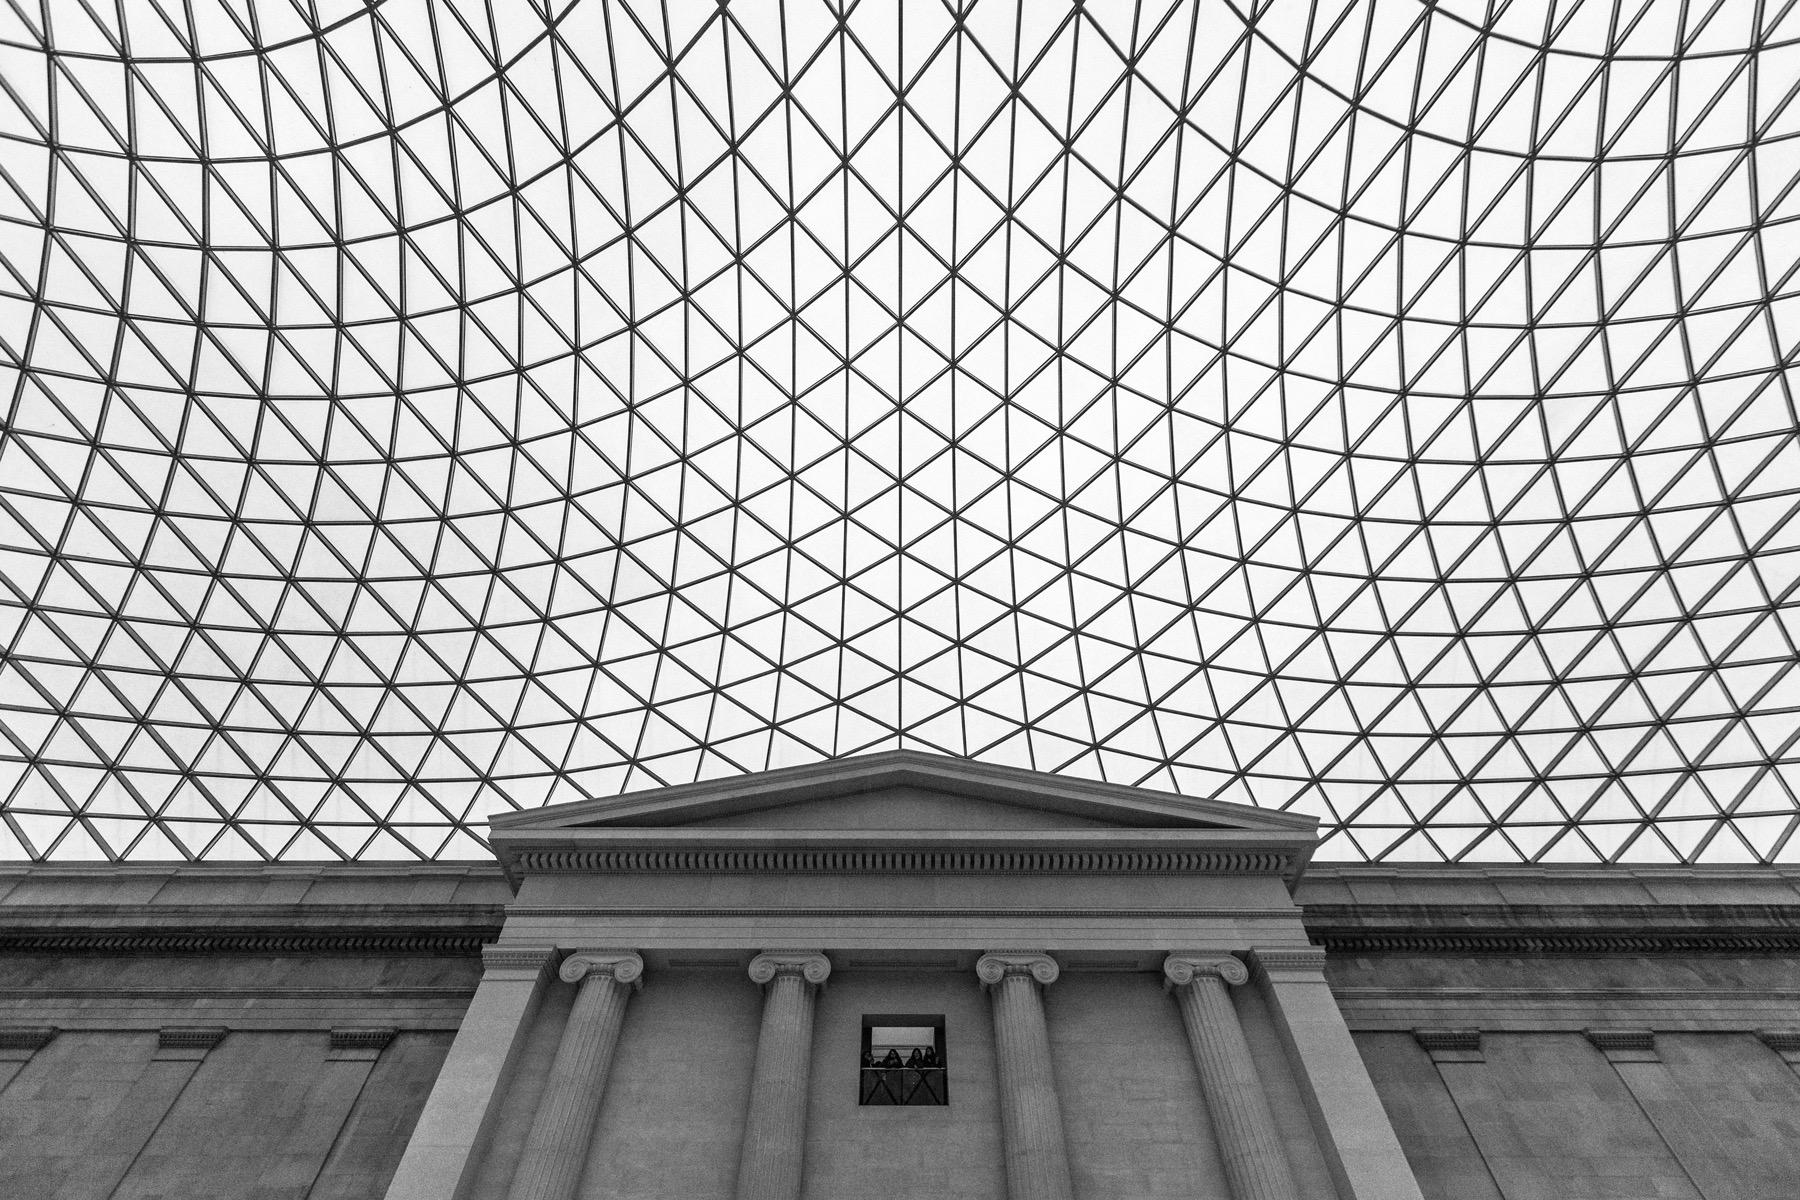 fabio_burrelli_street_photography_architecture_urban_structures_london_P5B3014.jpg